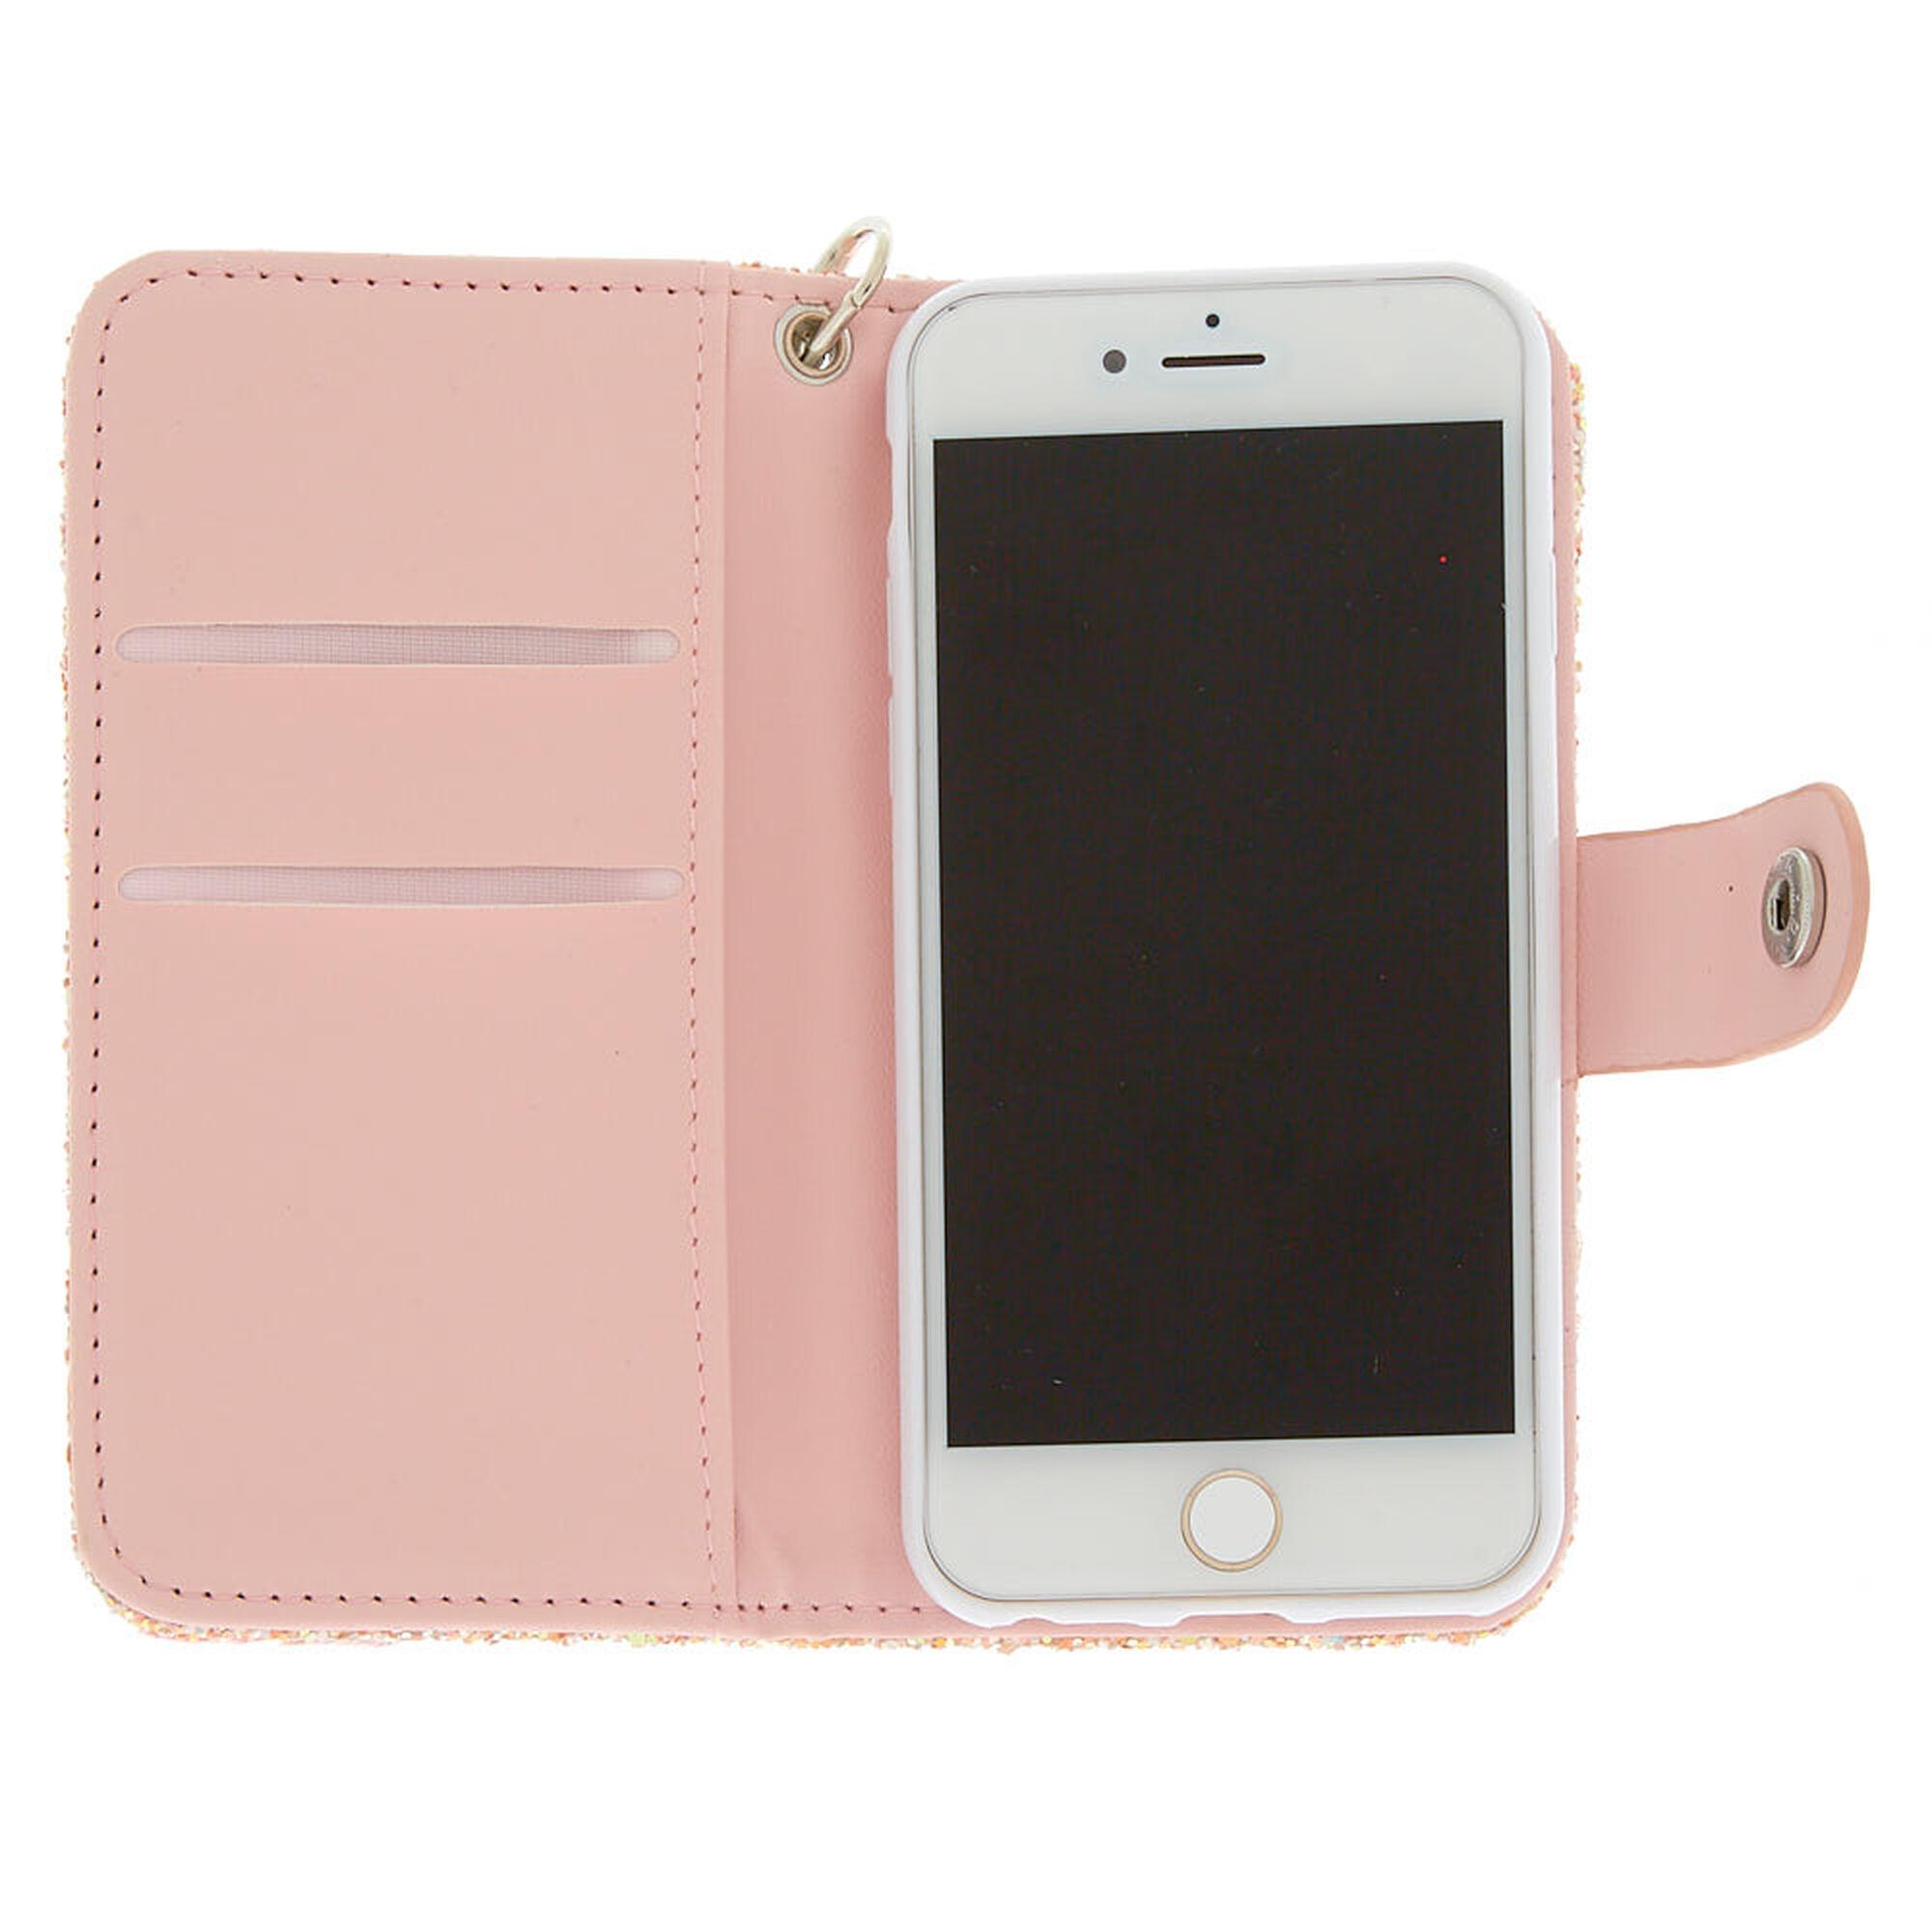 quality design 52867 30cf7 Blush Crushed Glitter Folio Phone Case - Fits iPhone 5/5S/5SE